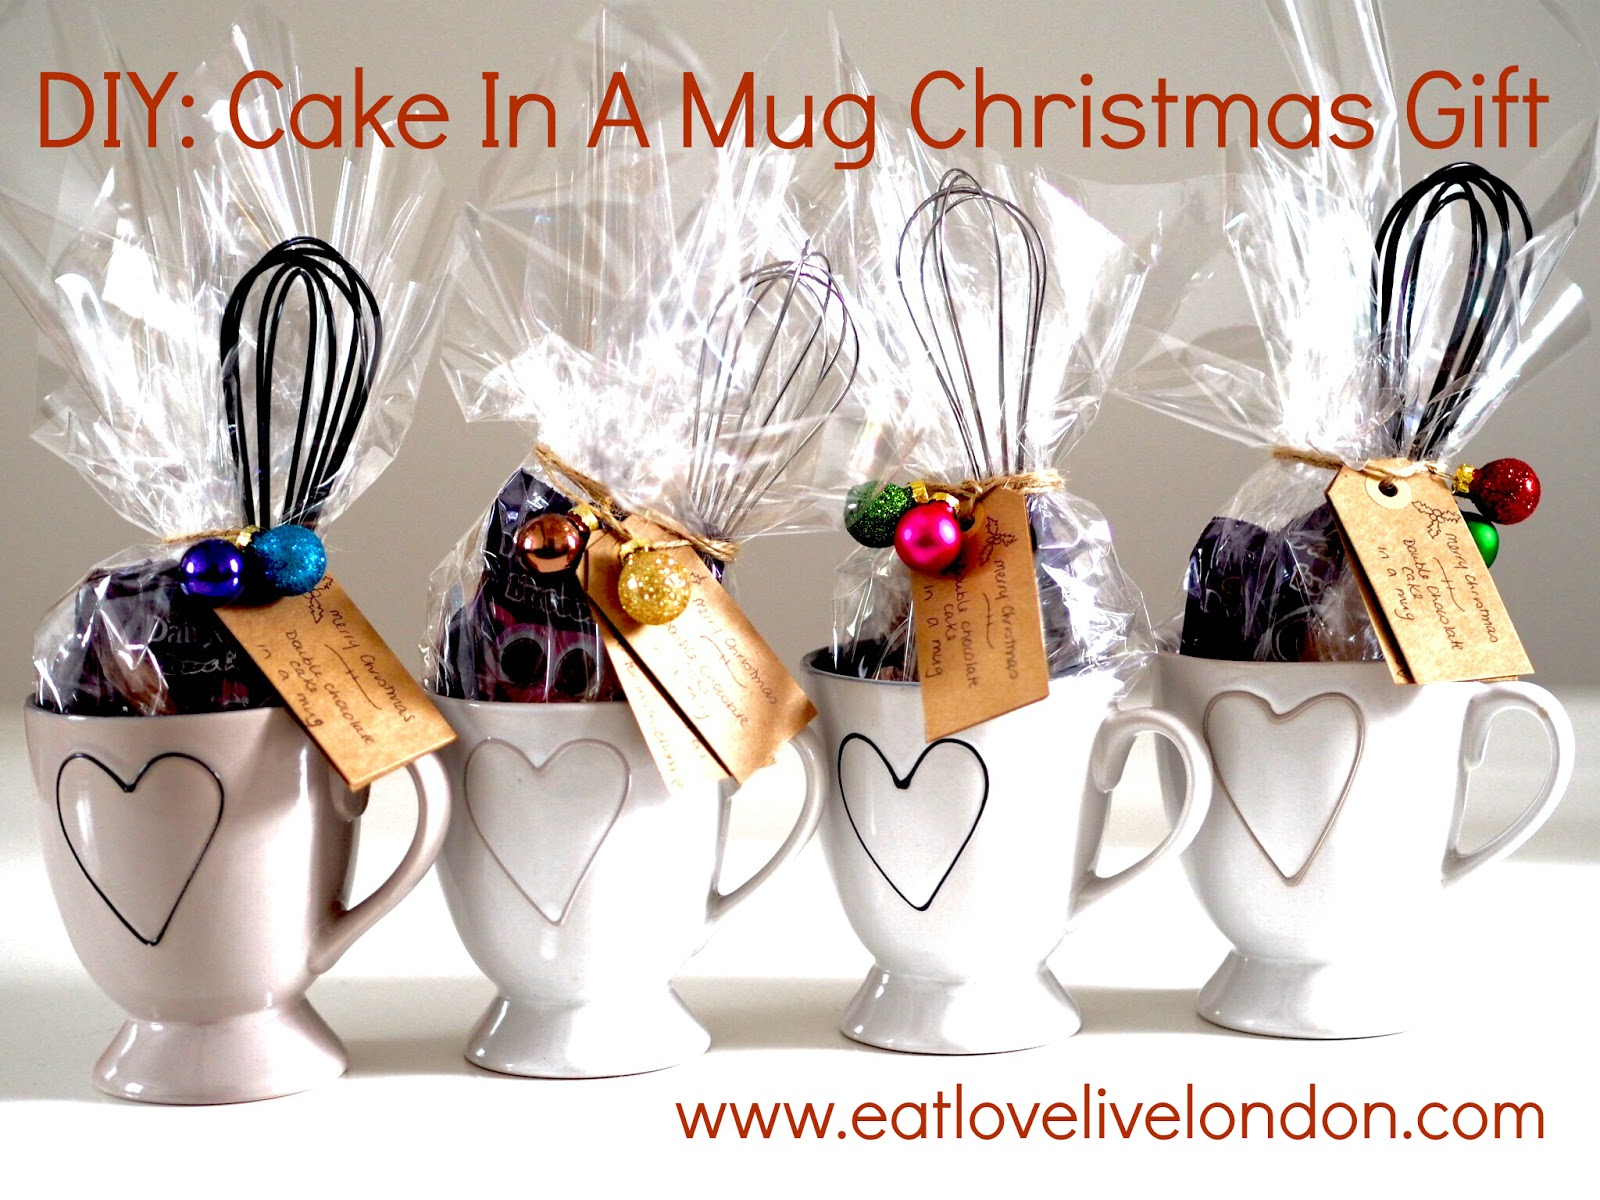 Diy Cake In A Mug Christmas Gift Double Chocolate Cake